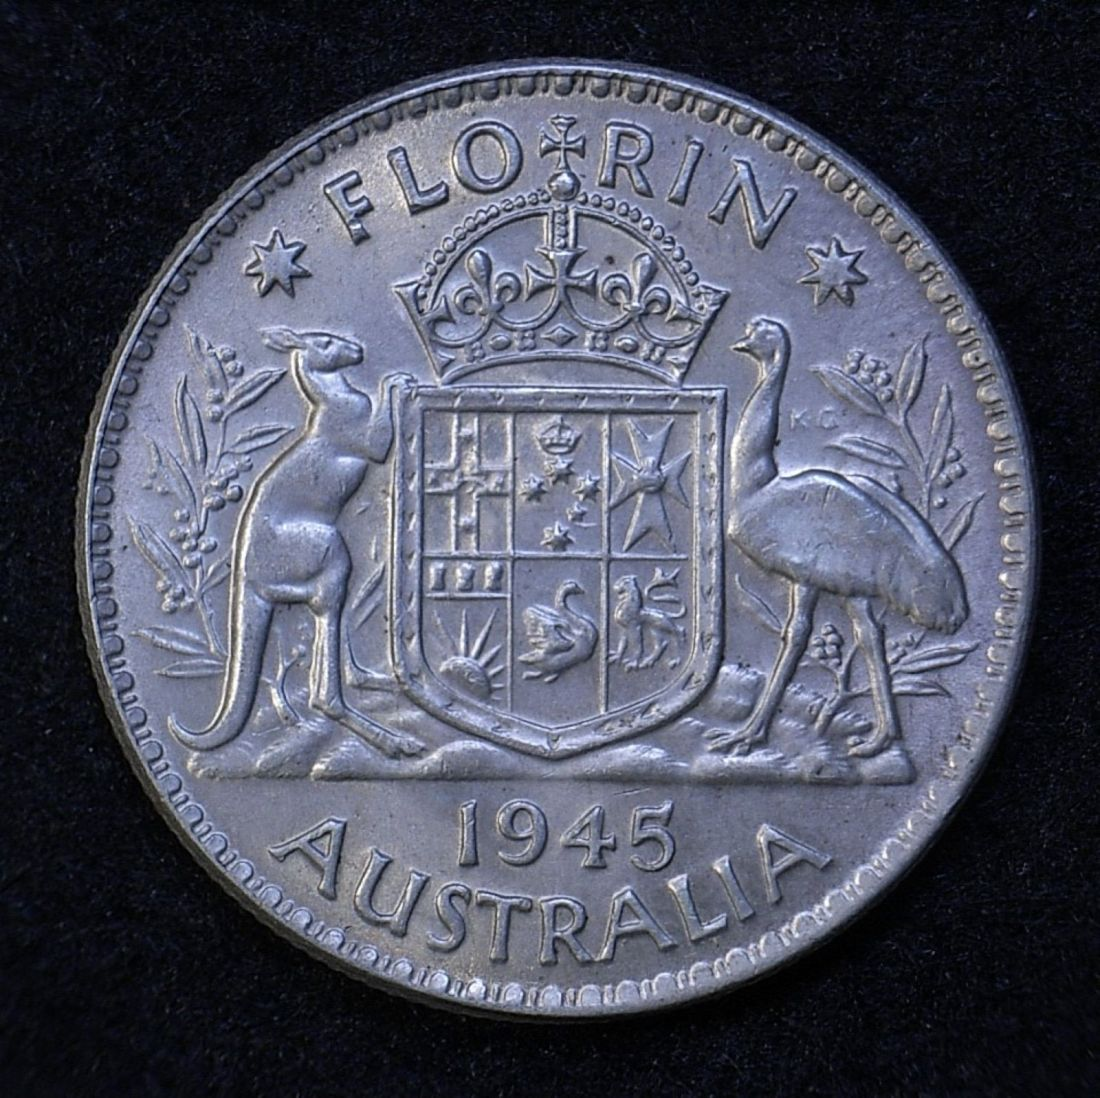 Close up Aus Florin 1945 reverse